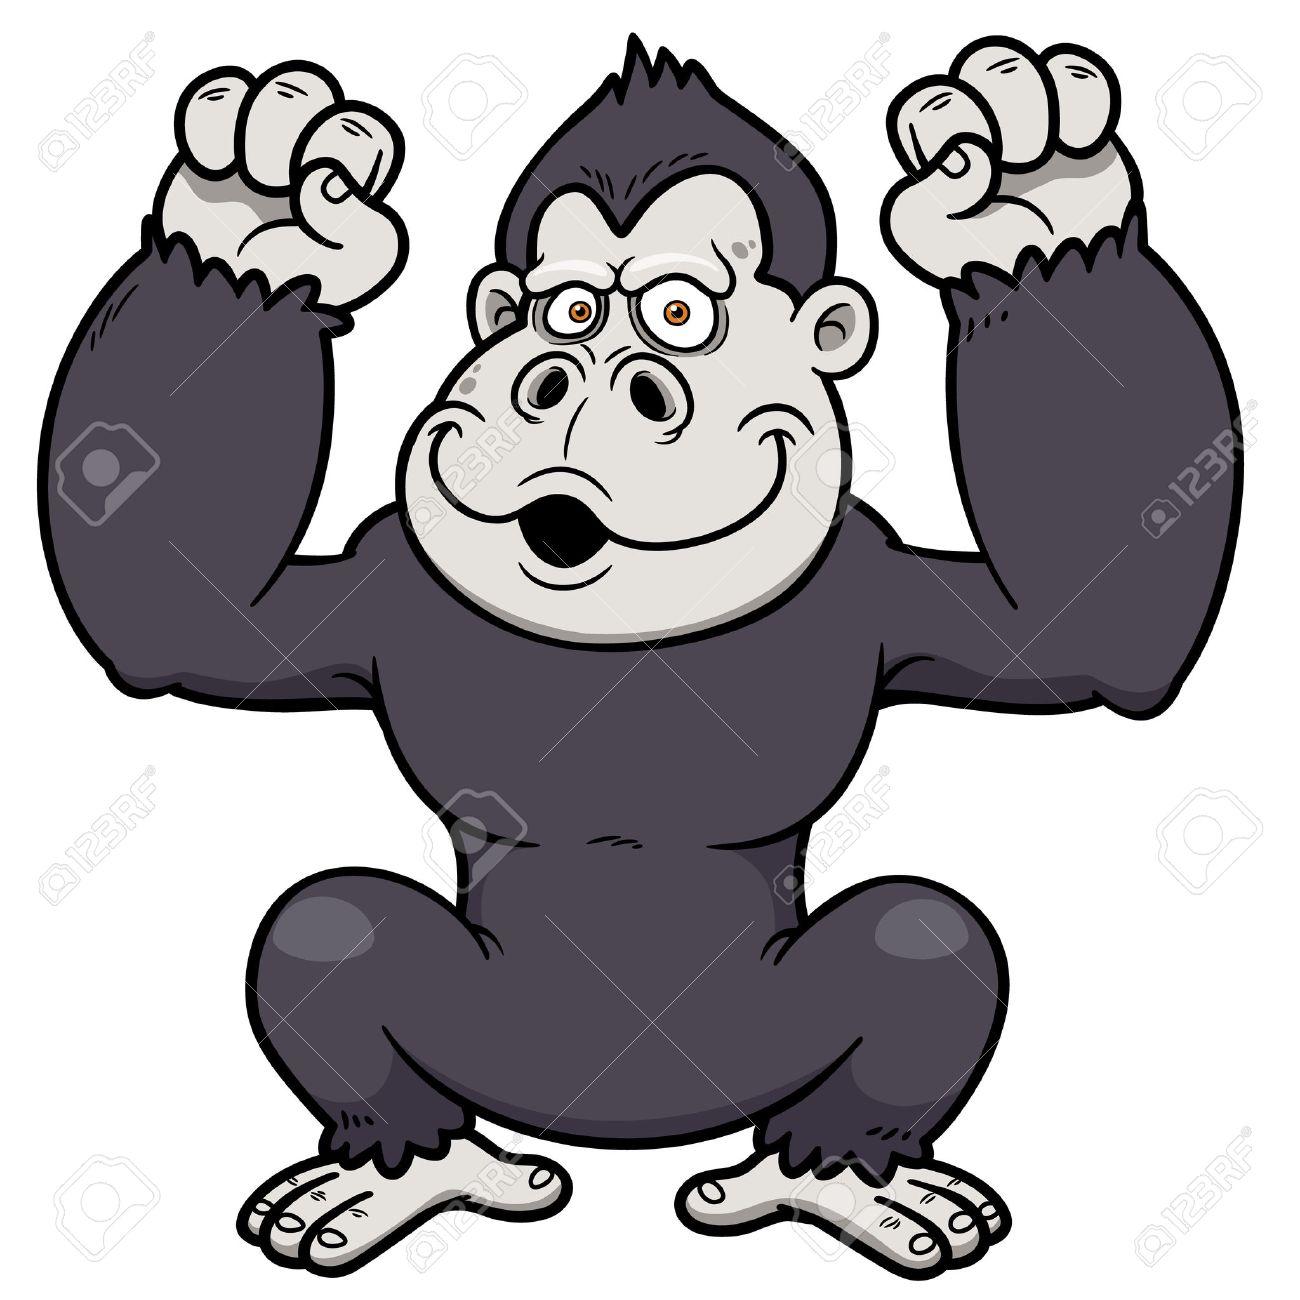 Cartoon Purple Gorilla of Gorilla Cartoon Vector